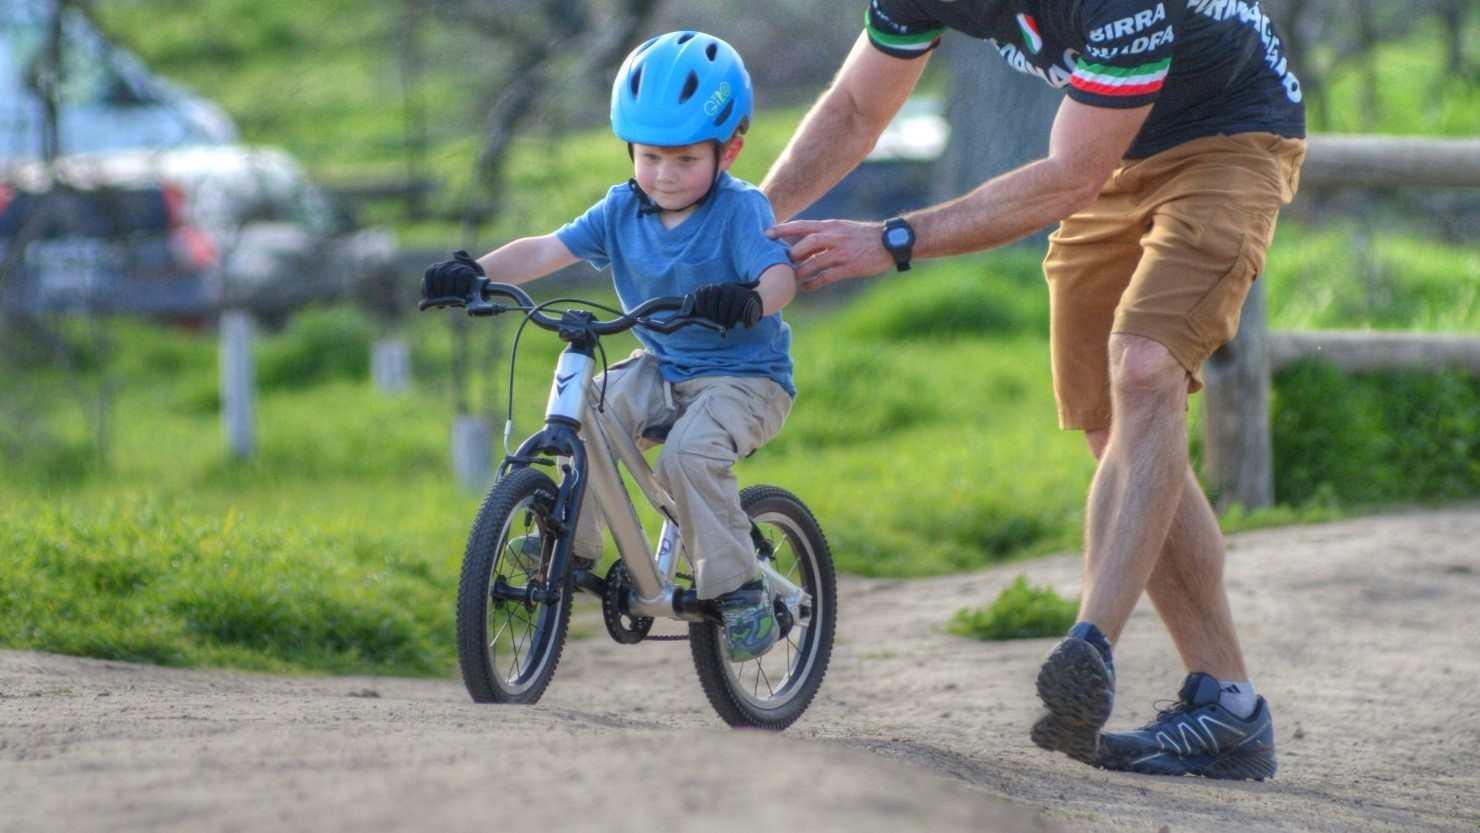 bici-ninos-montar-padres